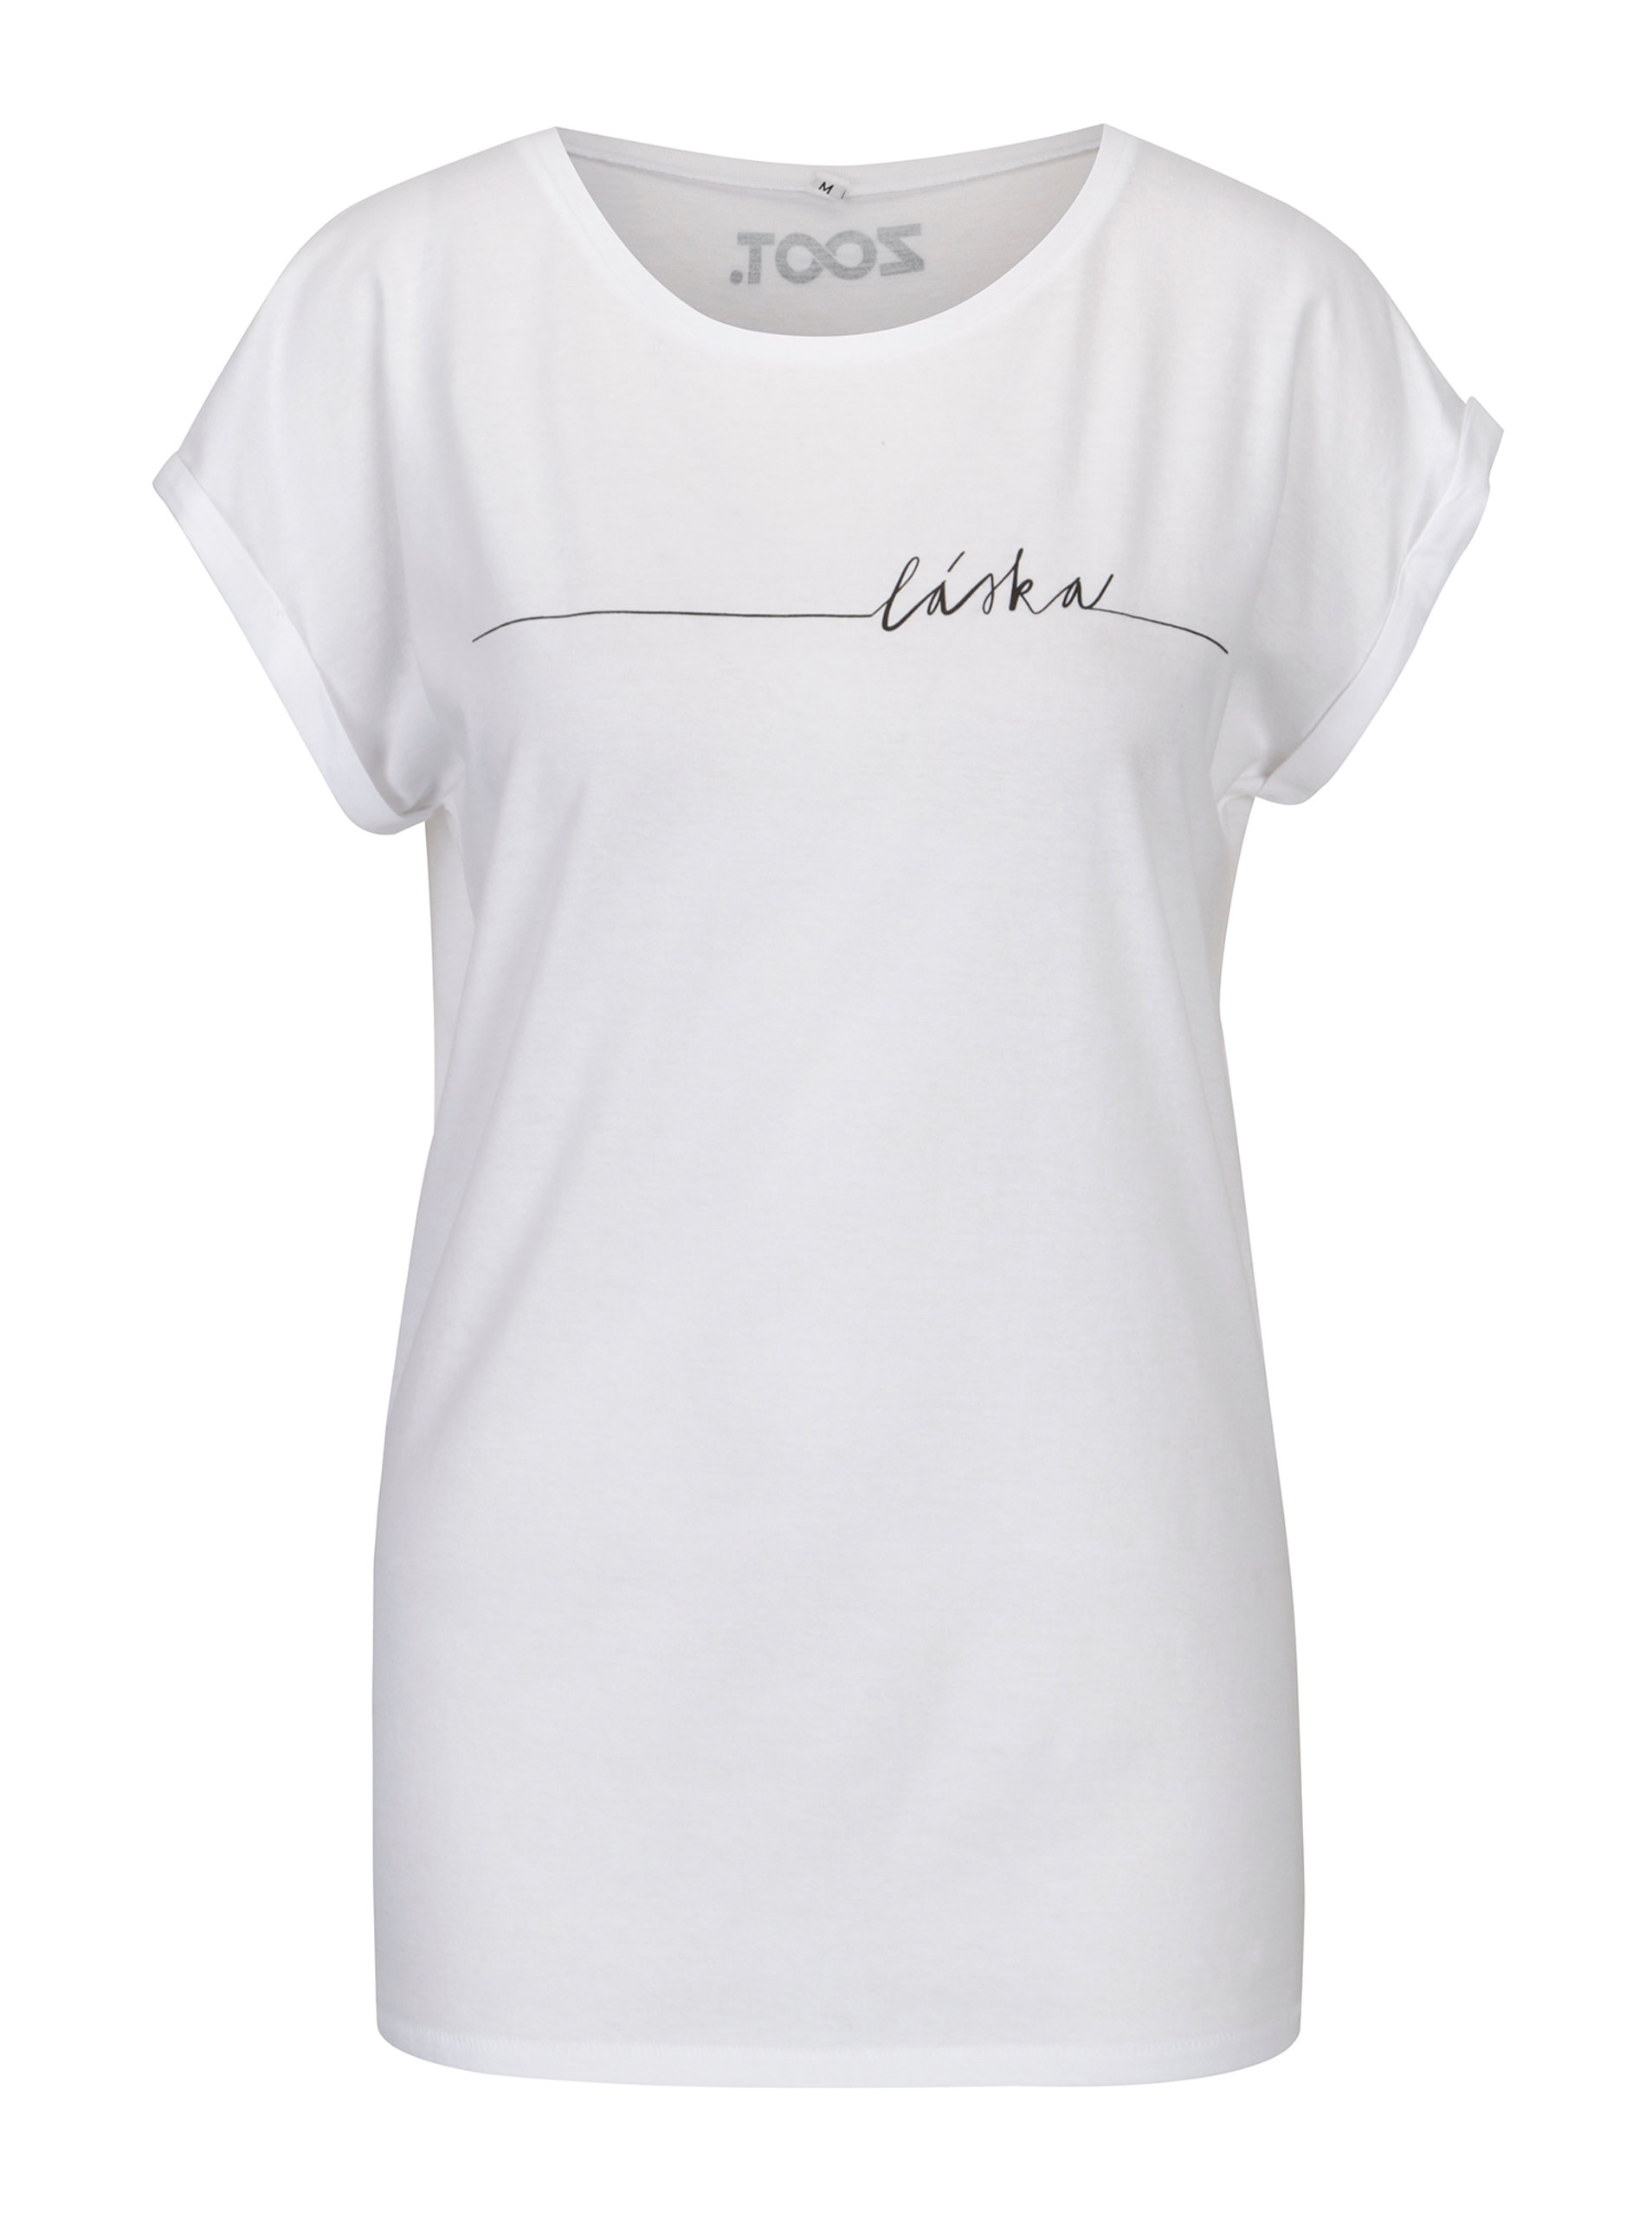 Bílé dámské tričko s potiskem ZOOT Original Láska ... 4b5c4dff2f